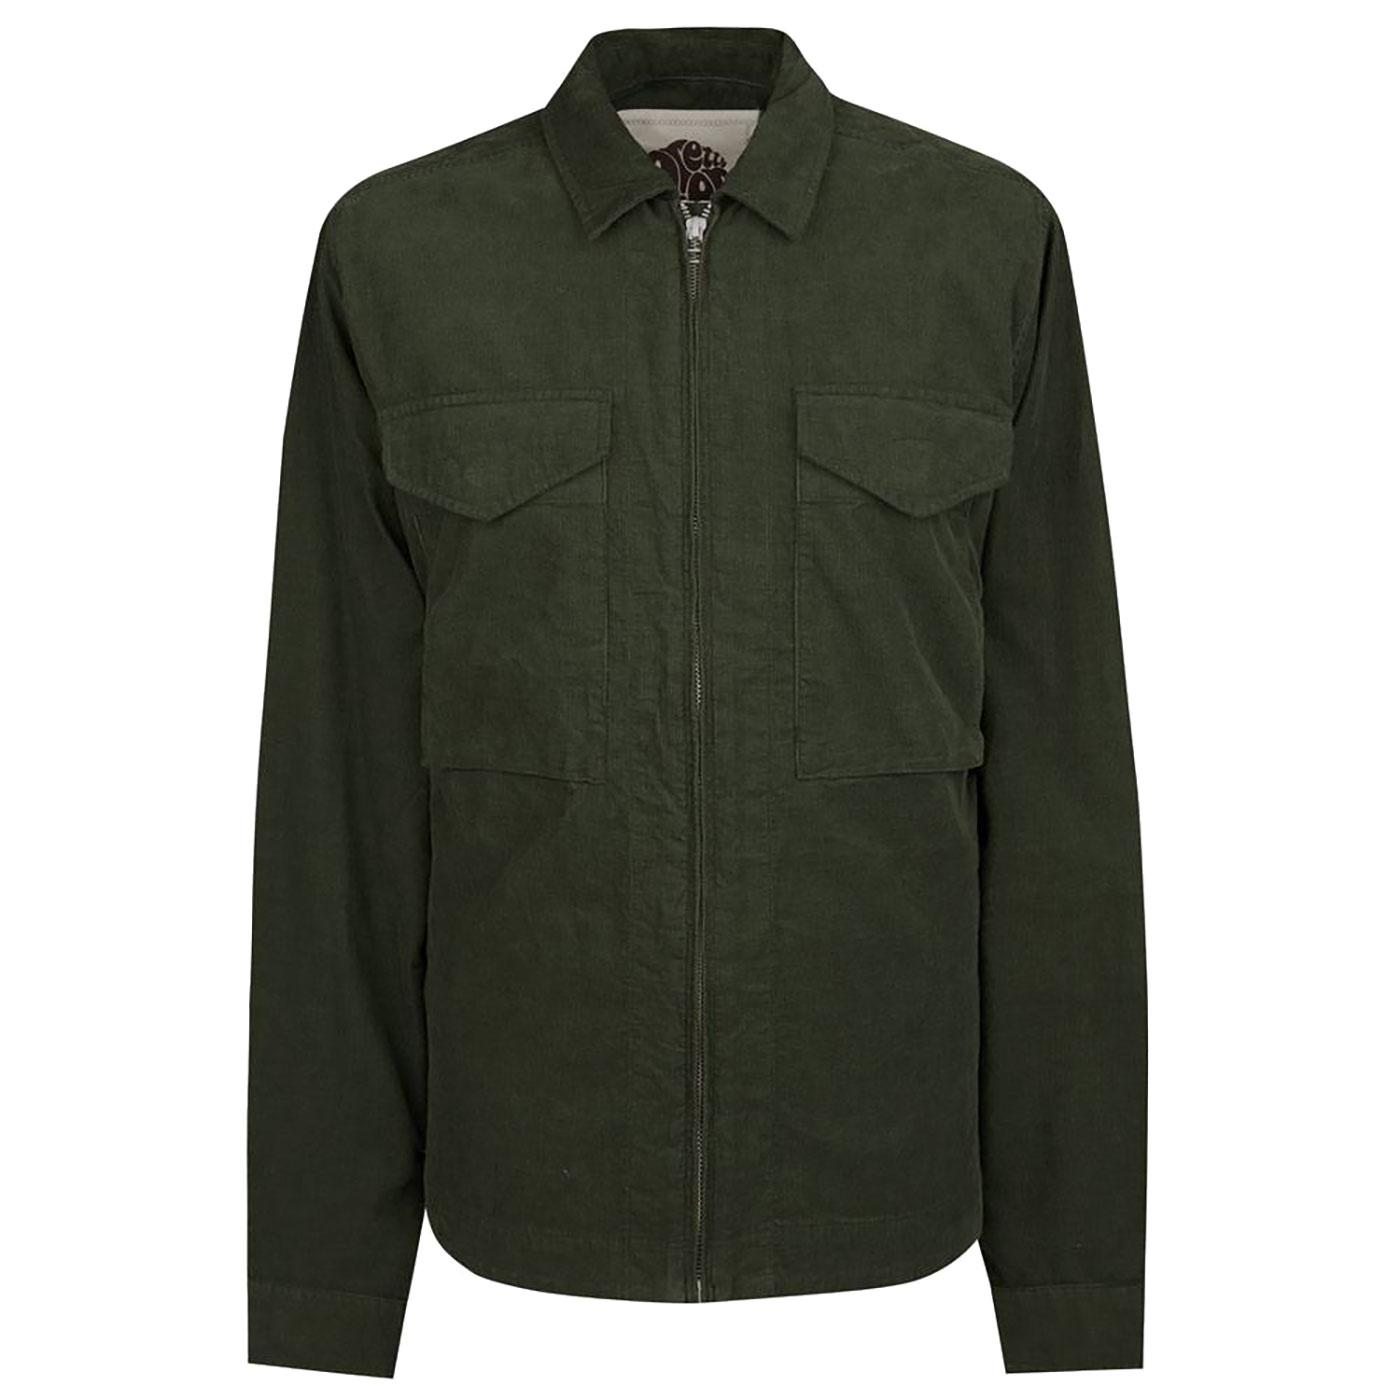 PRETTY GREEN Retro Zip Up Cord Overshirt Jacket